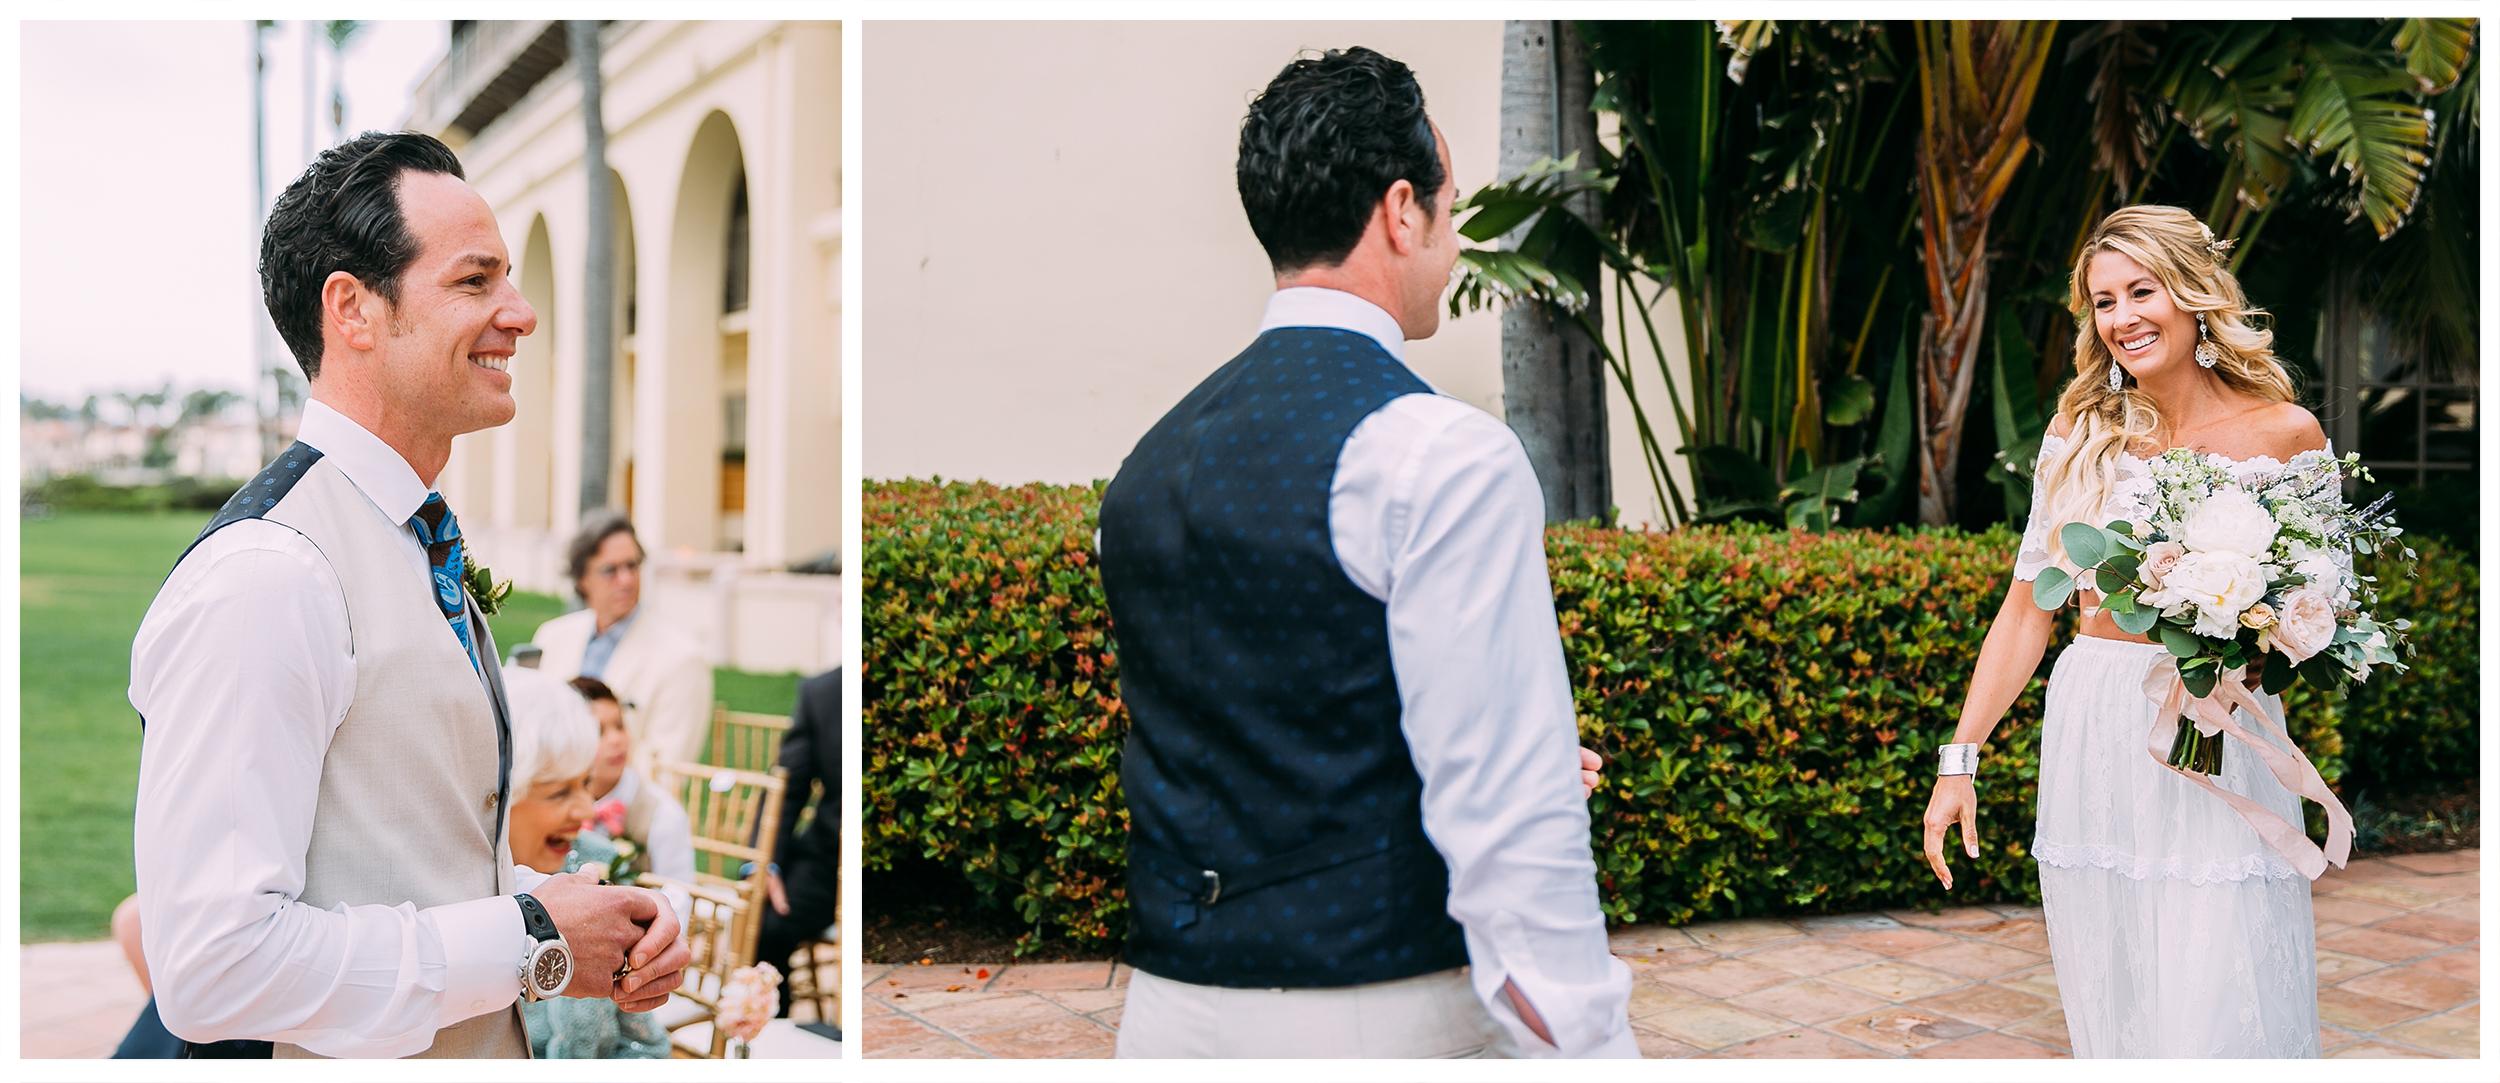 TD-Ritz-Carlton-Laguna-Niguel-Wedding-Photography-16.jpg